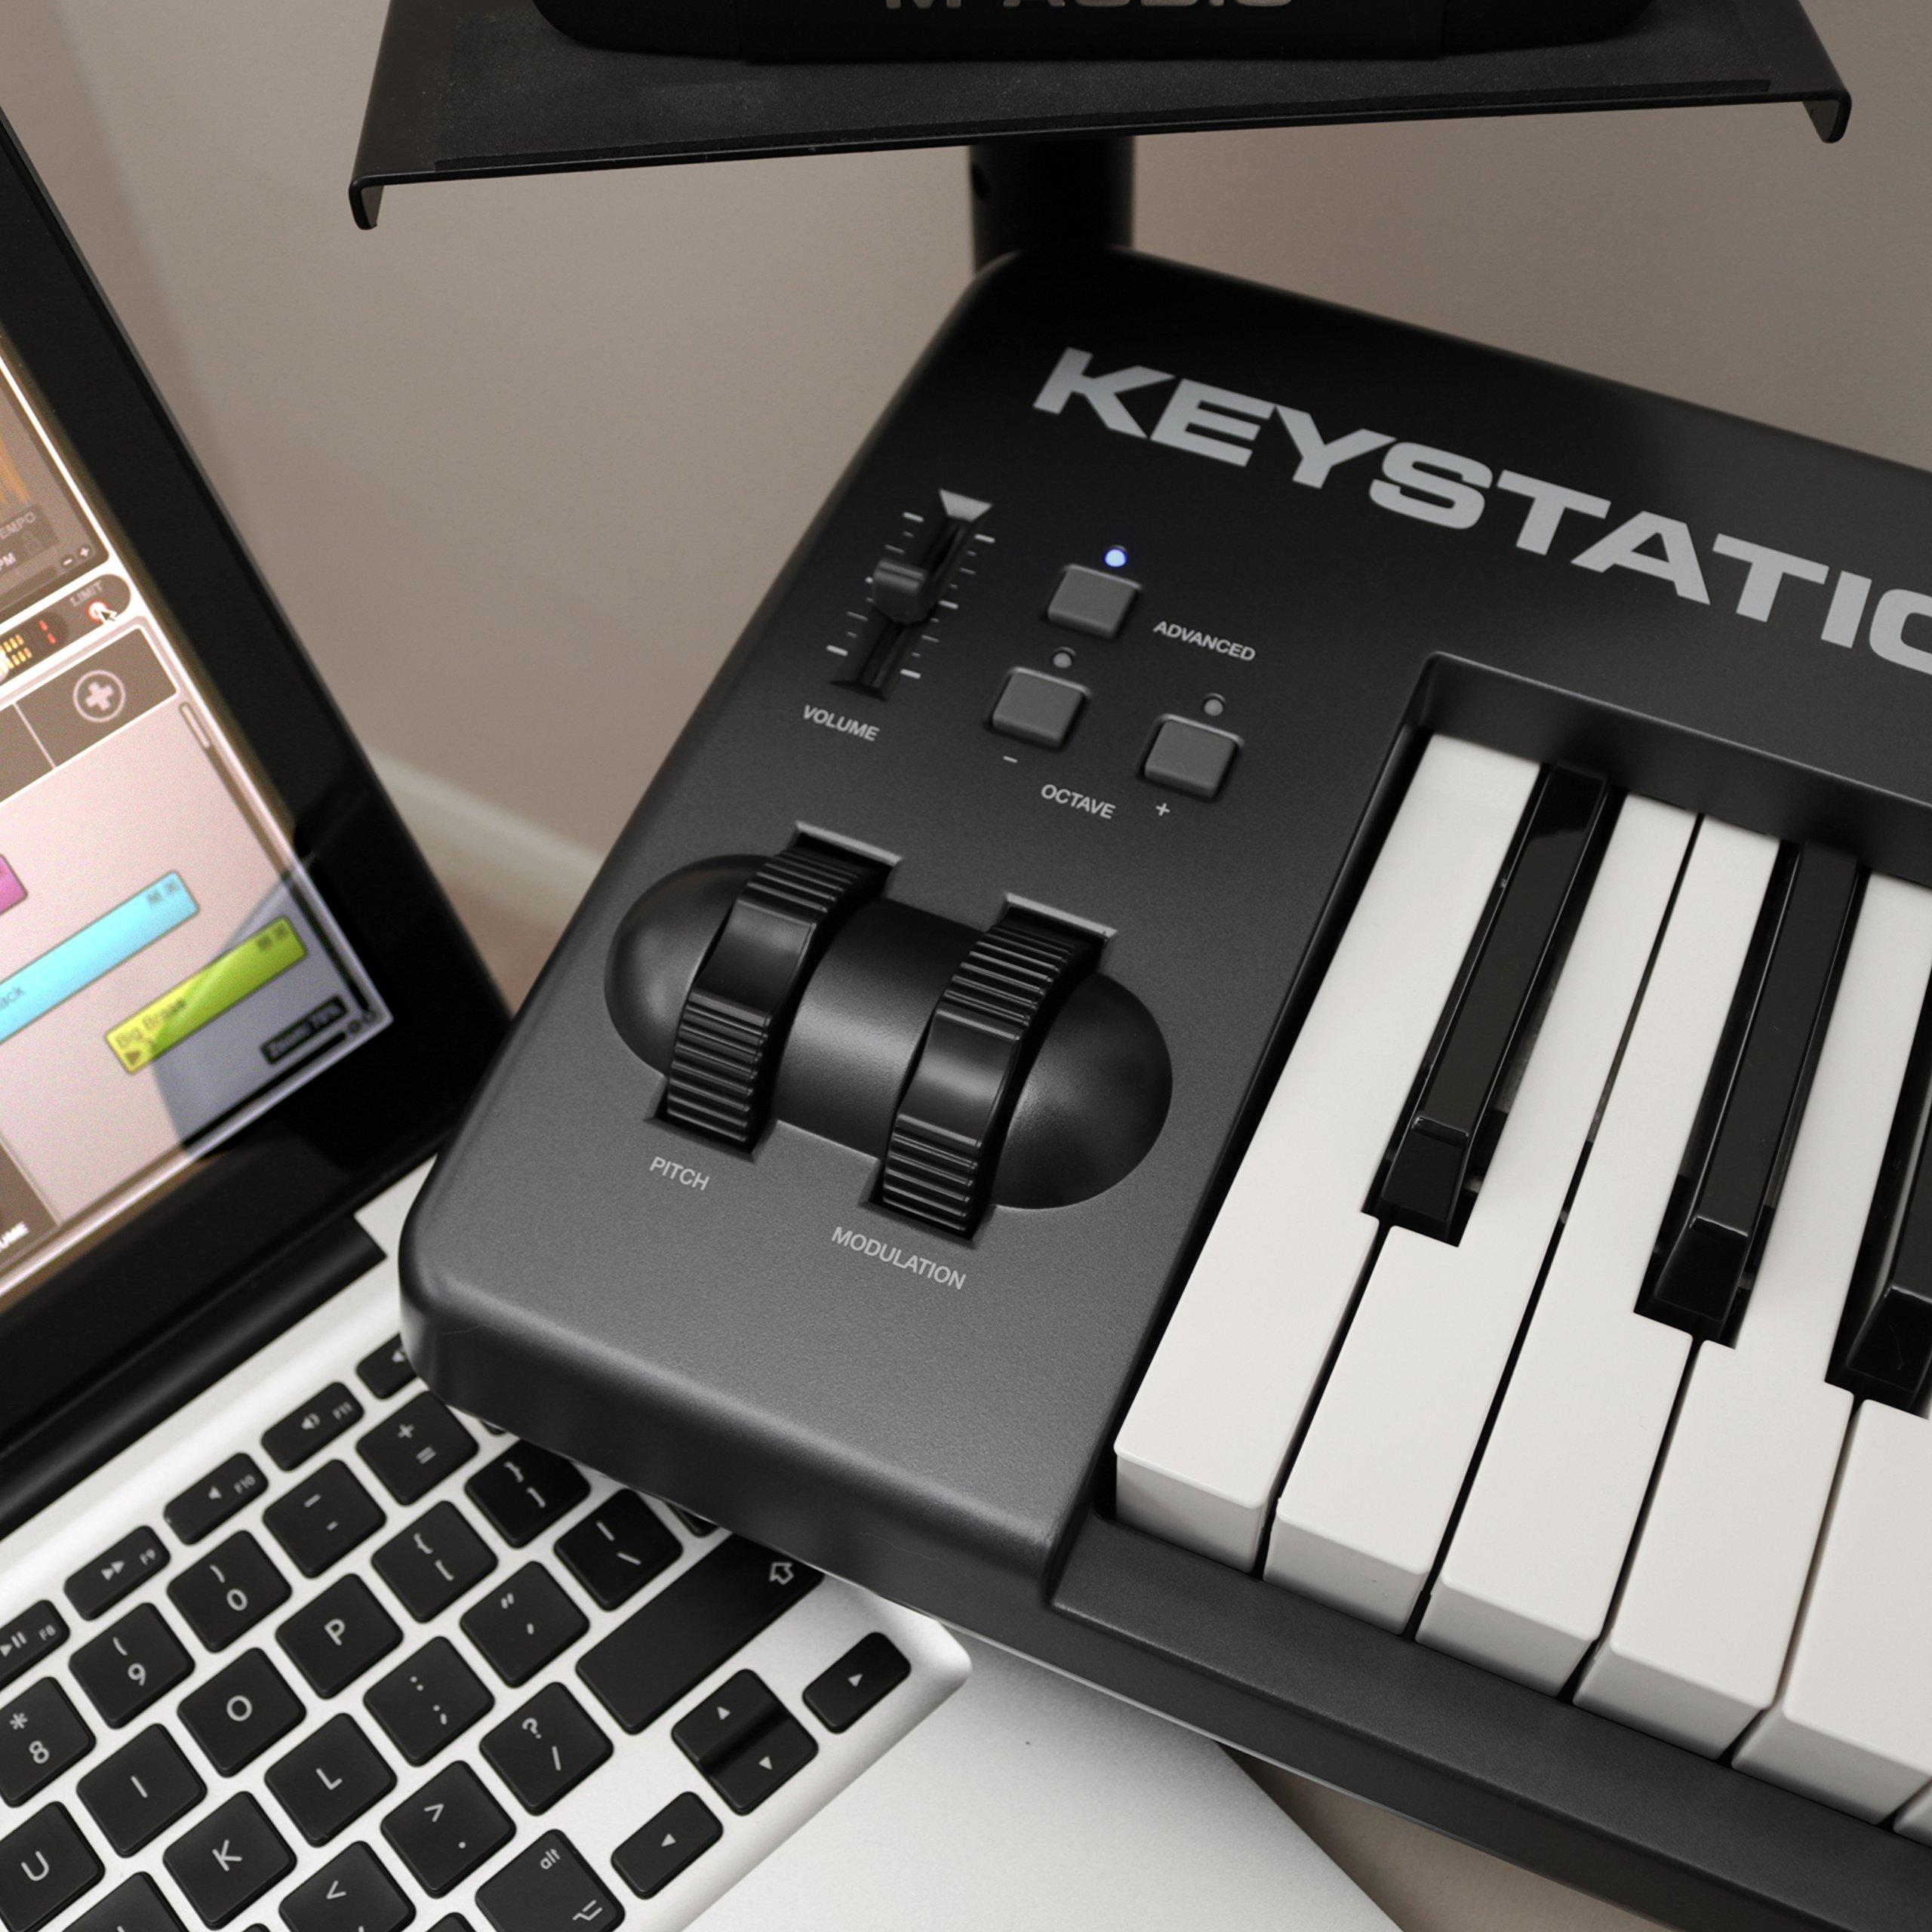 galleon m audio keystation 88 ii 88 key usb midi keyboard controller with pitch bend. Black Bedroom Furniture Sets. Home Design Ideas